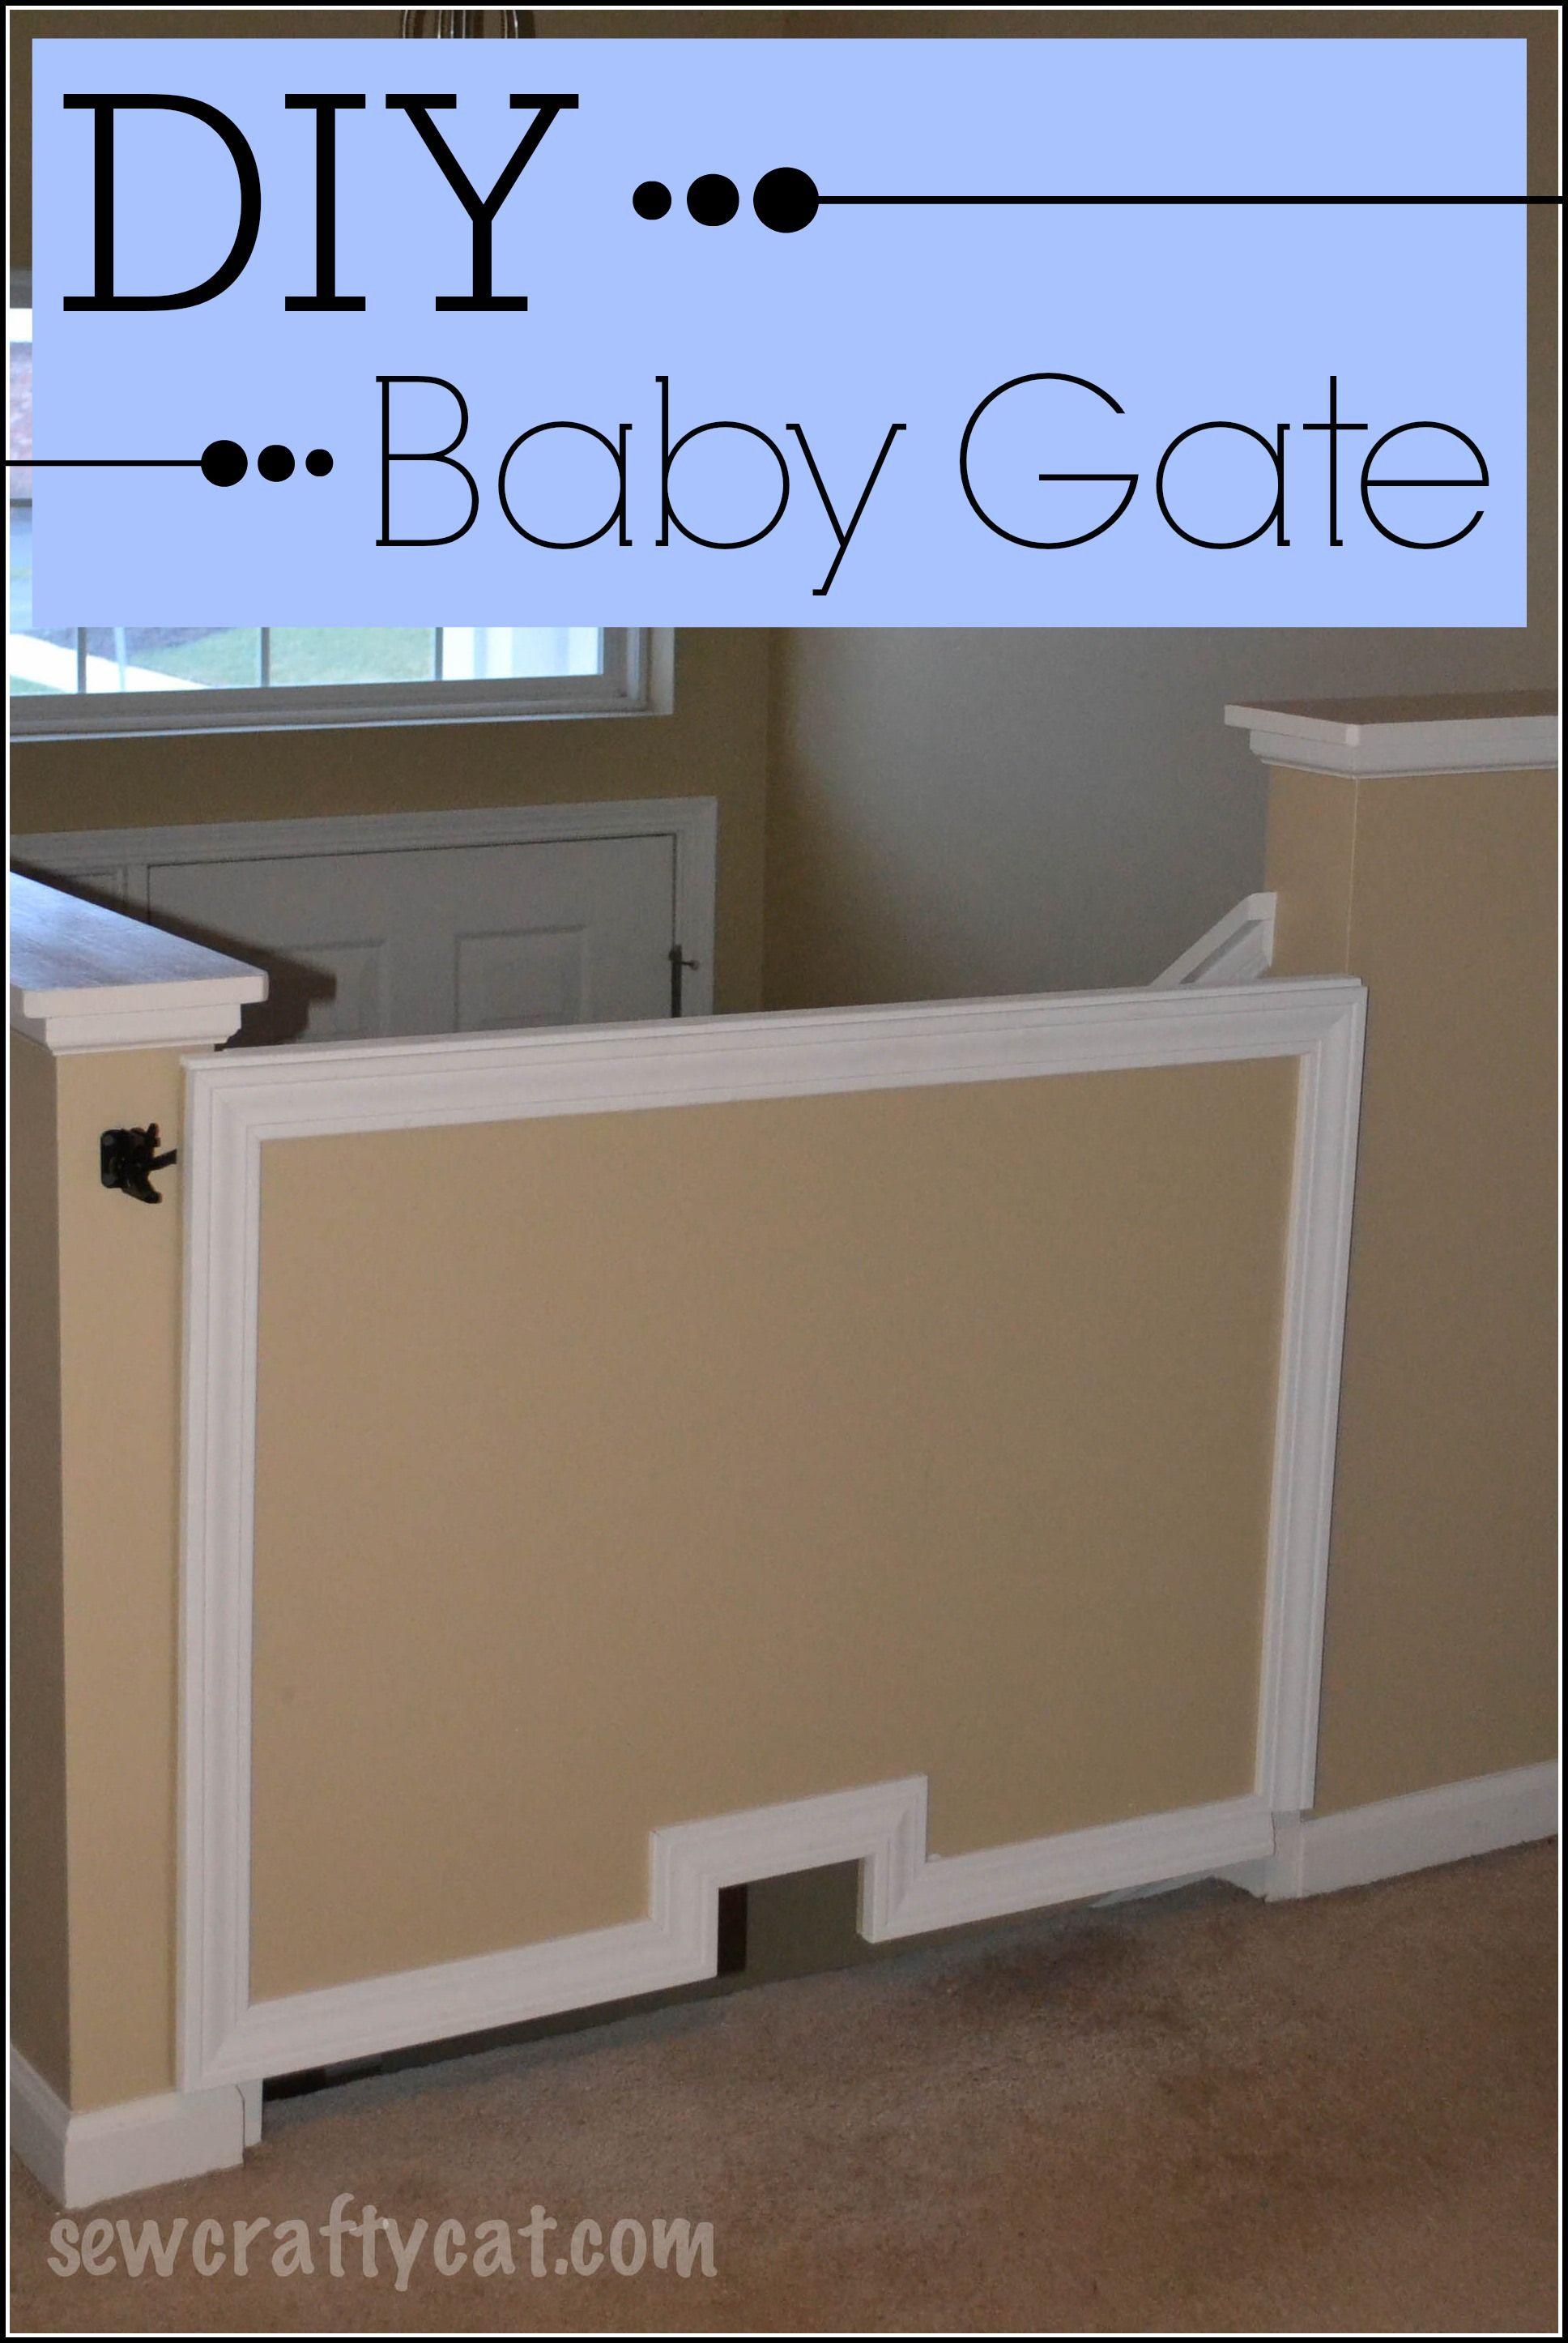 Diy Baby Gate Sewcraftycatcom Baby Gate Made Of Plywood